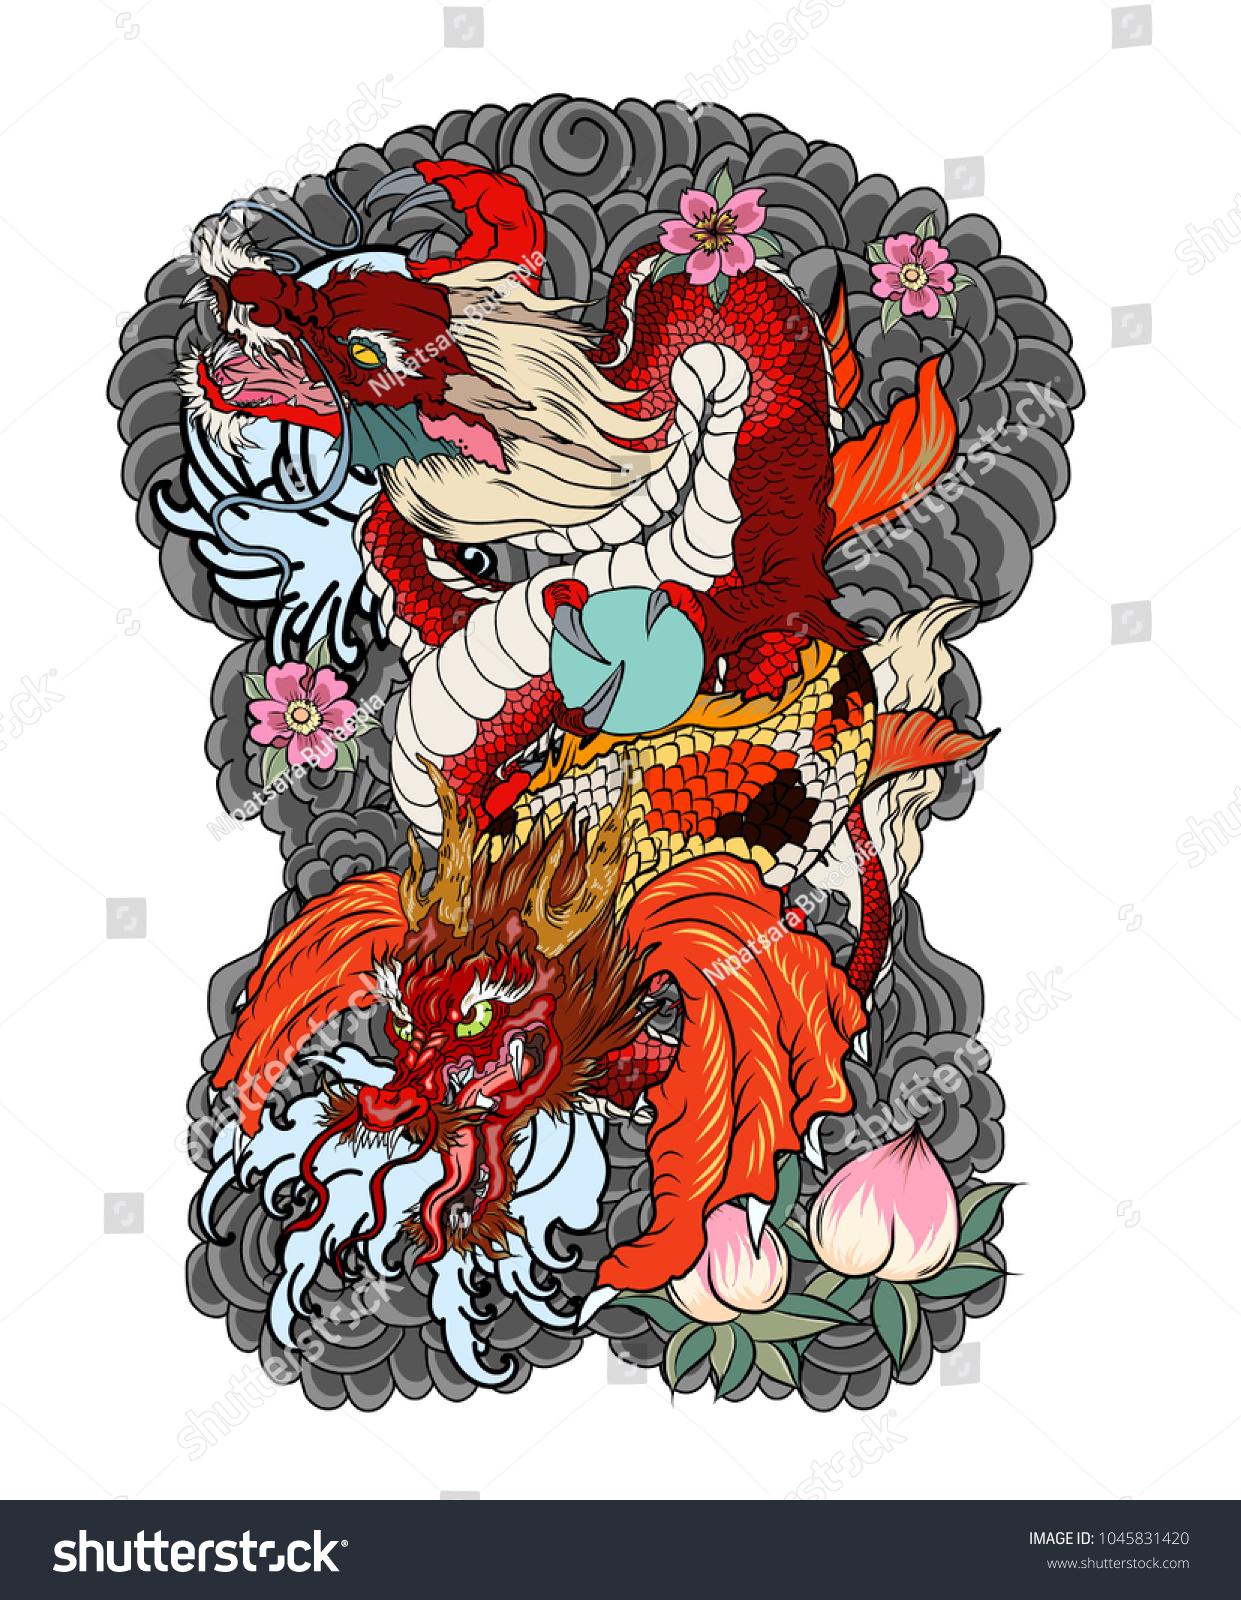 Dragon koi dragon lotus flower tattoopeach stock vector 1045831420 dragon with koi dragon and lotus flower tattooach with sakura and plum flower on izmirmasajfo